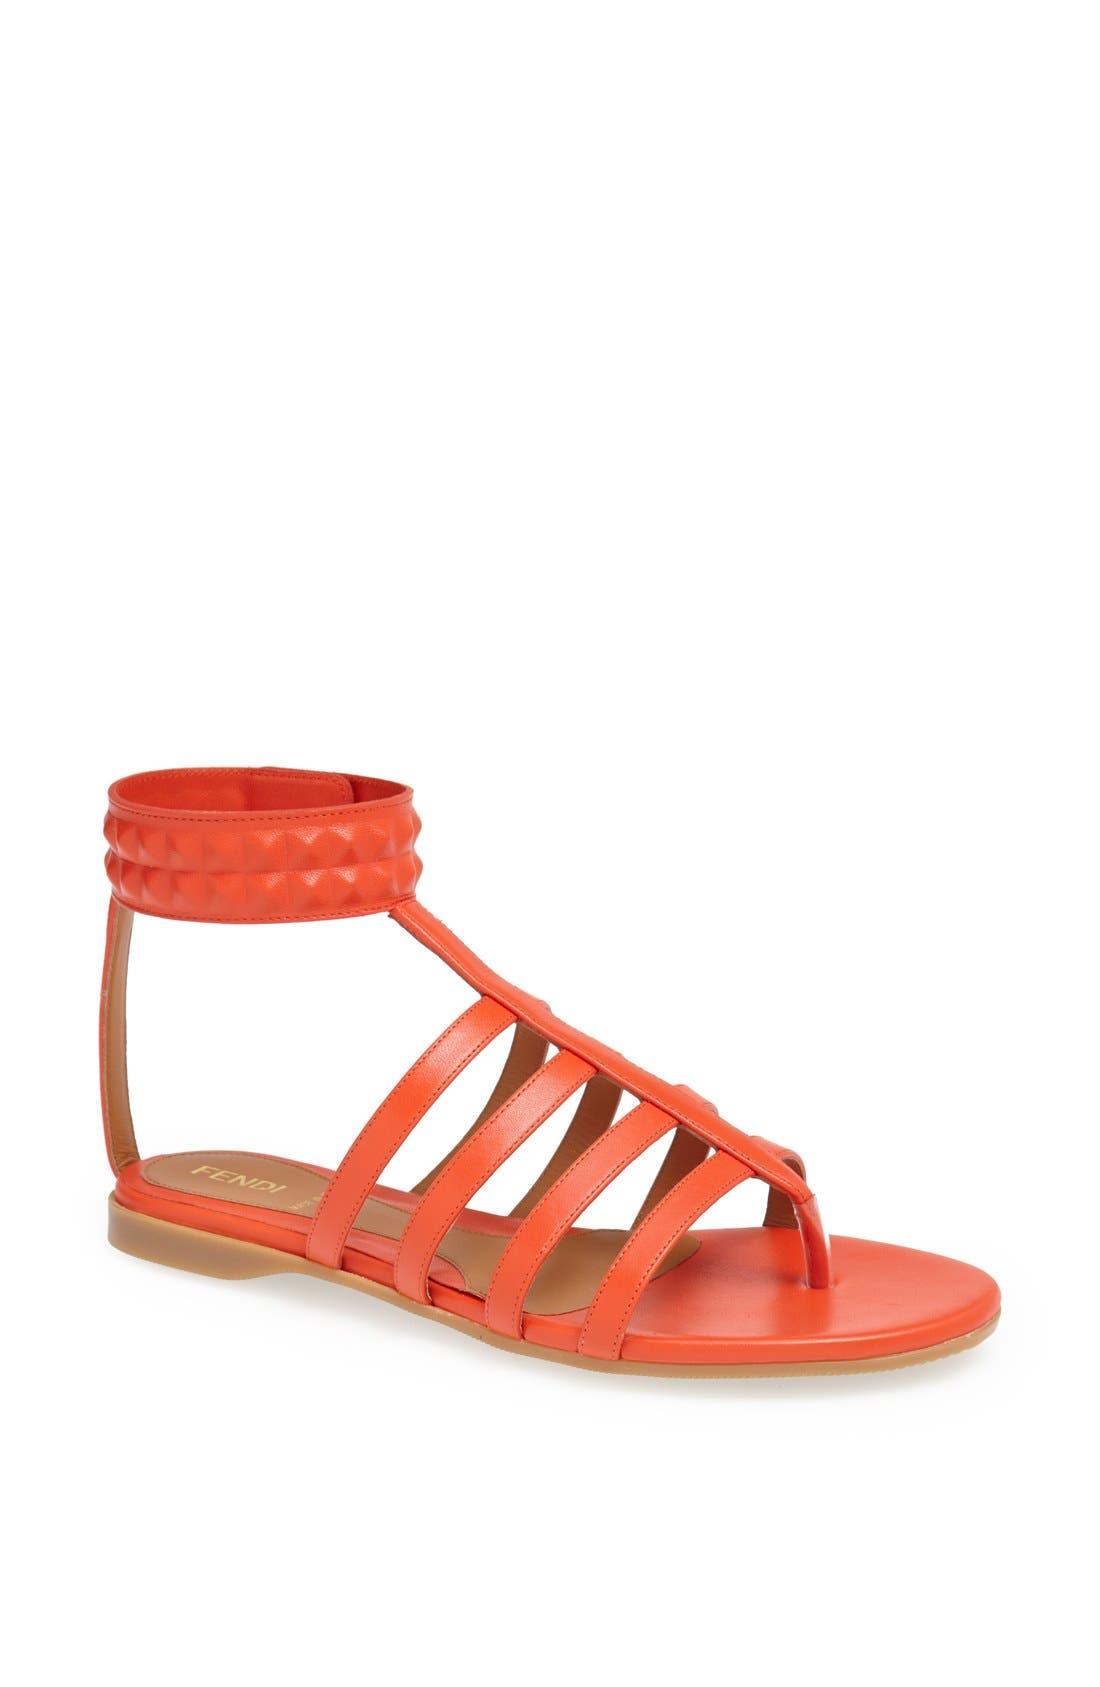 Main Image - Fendi 'Diana' Leather Sandal